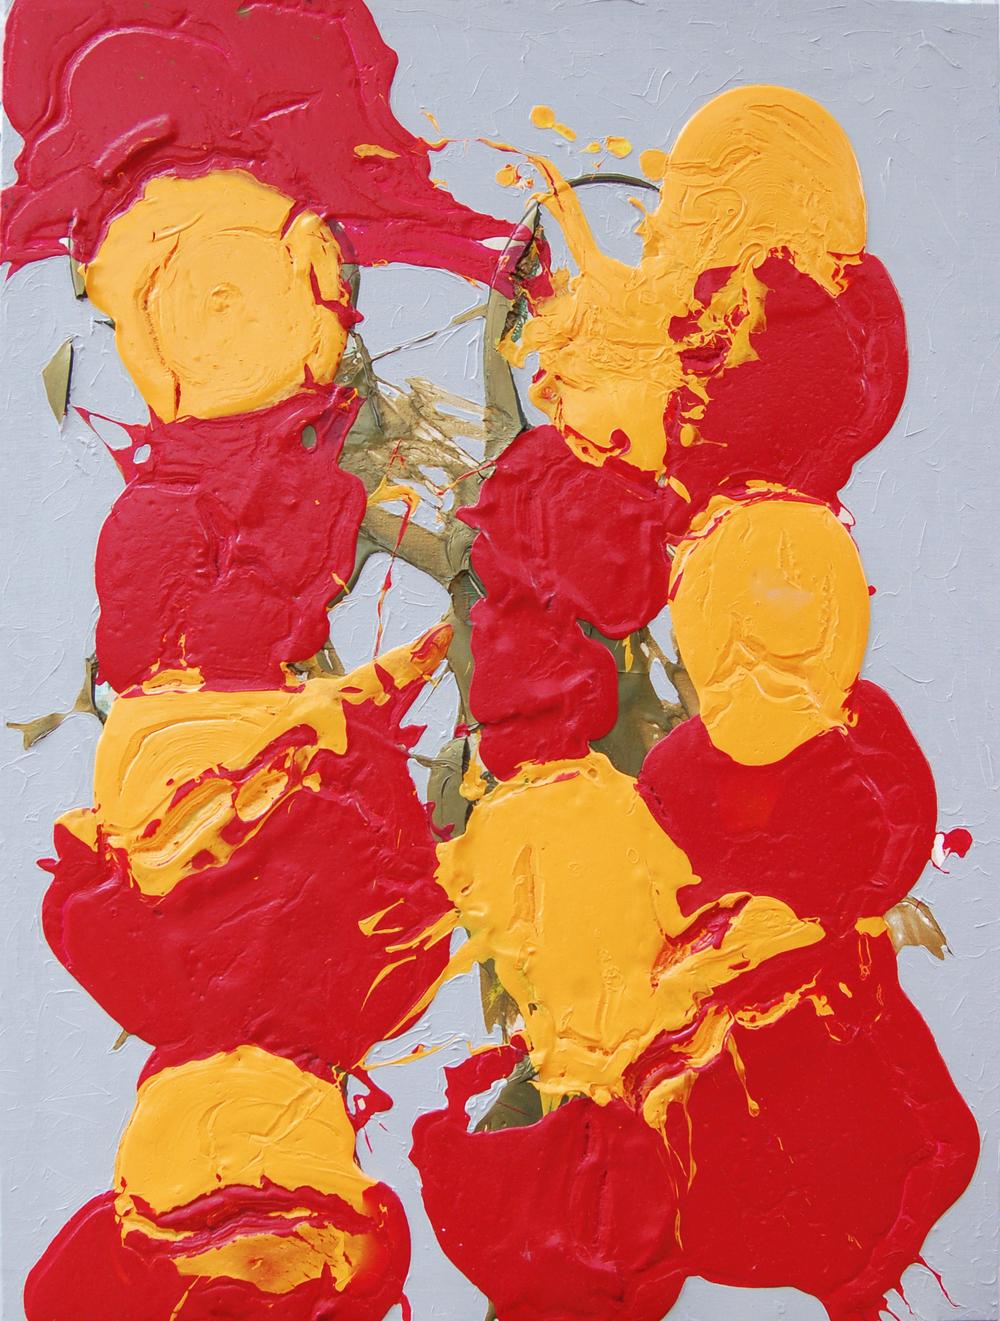 Bolas de nervios, 2007